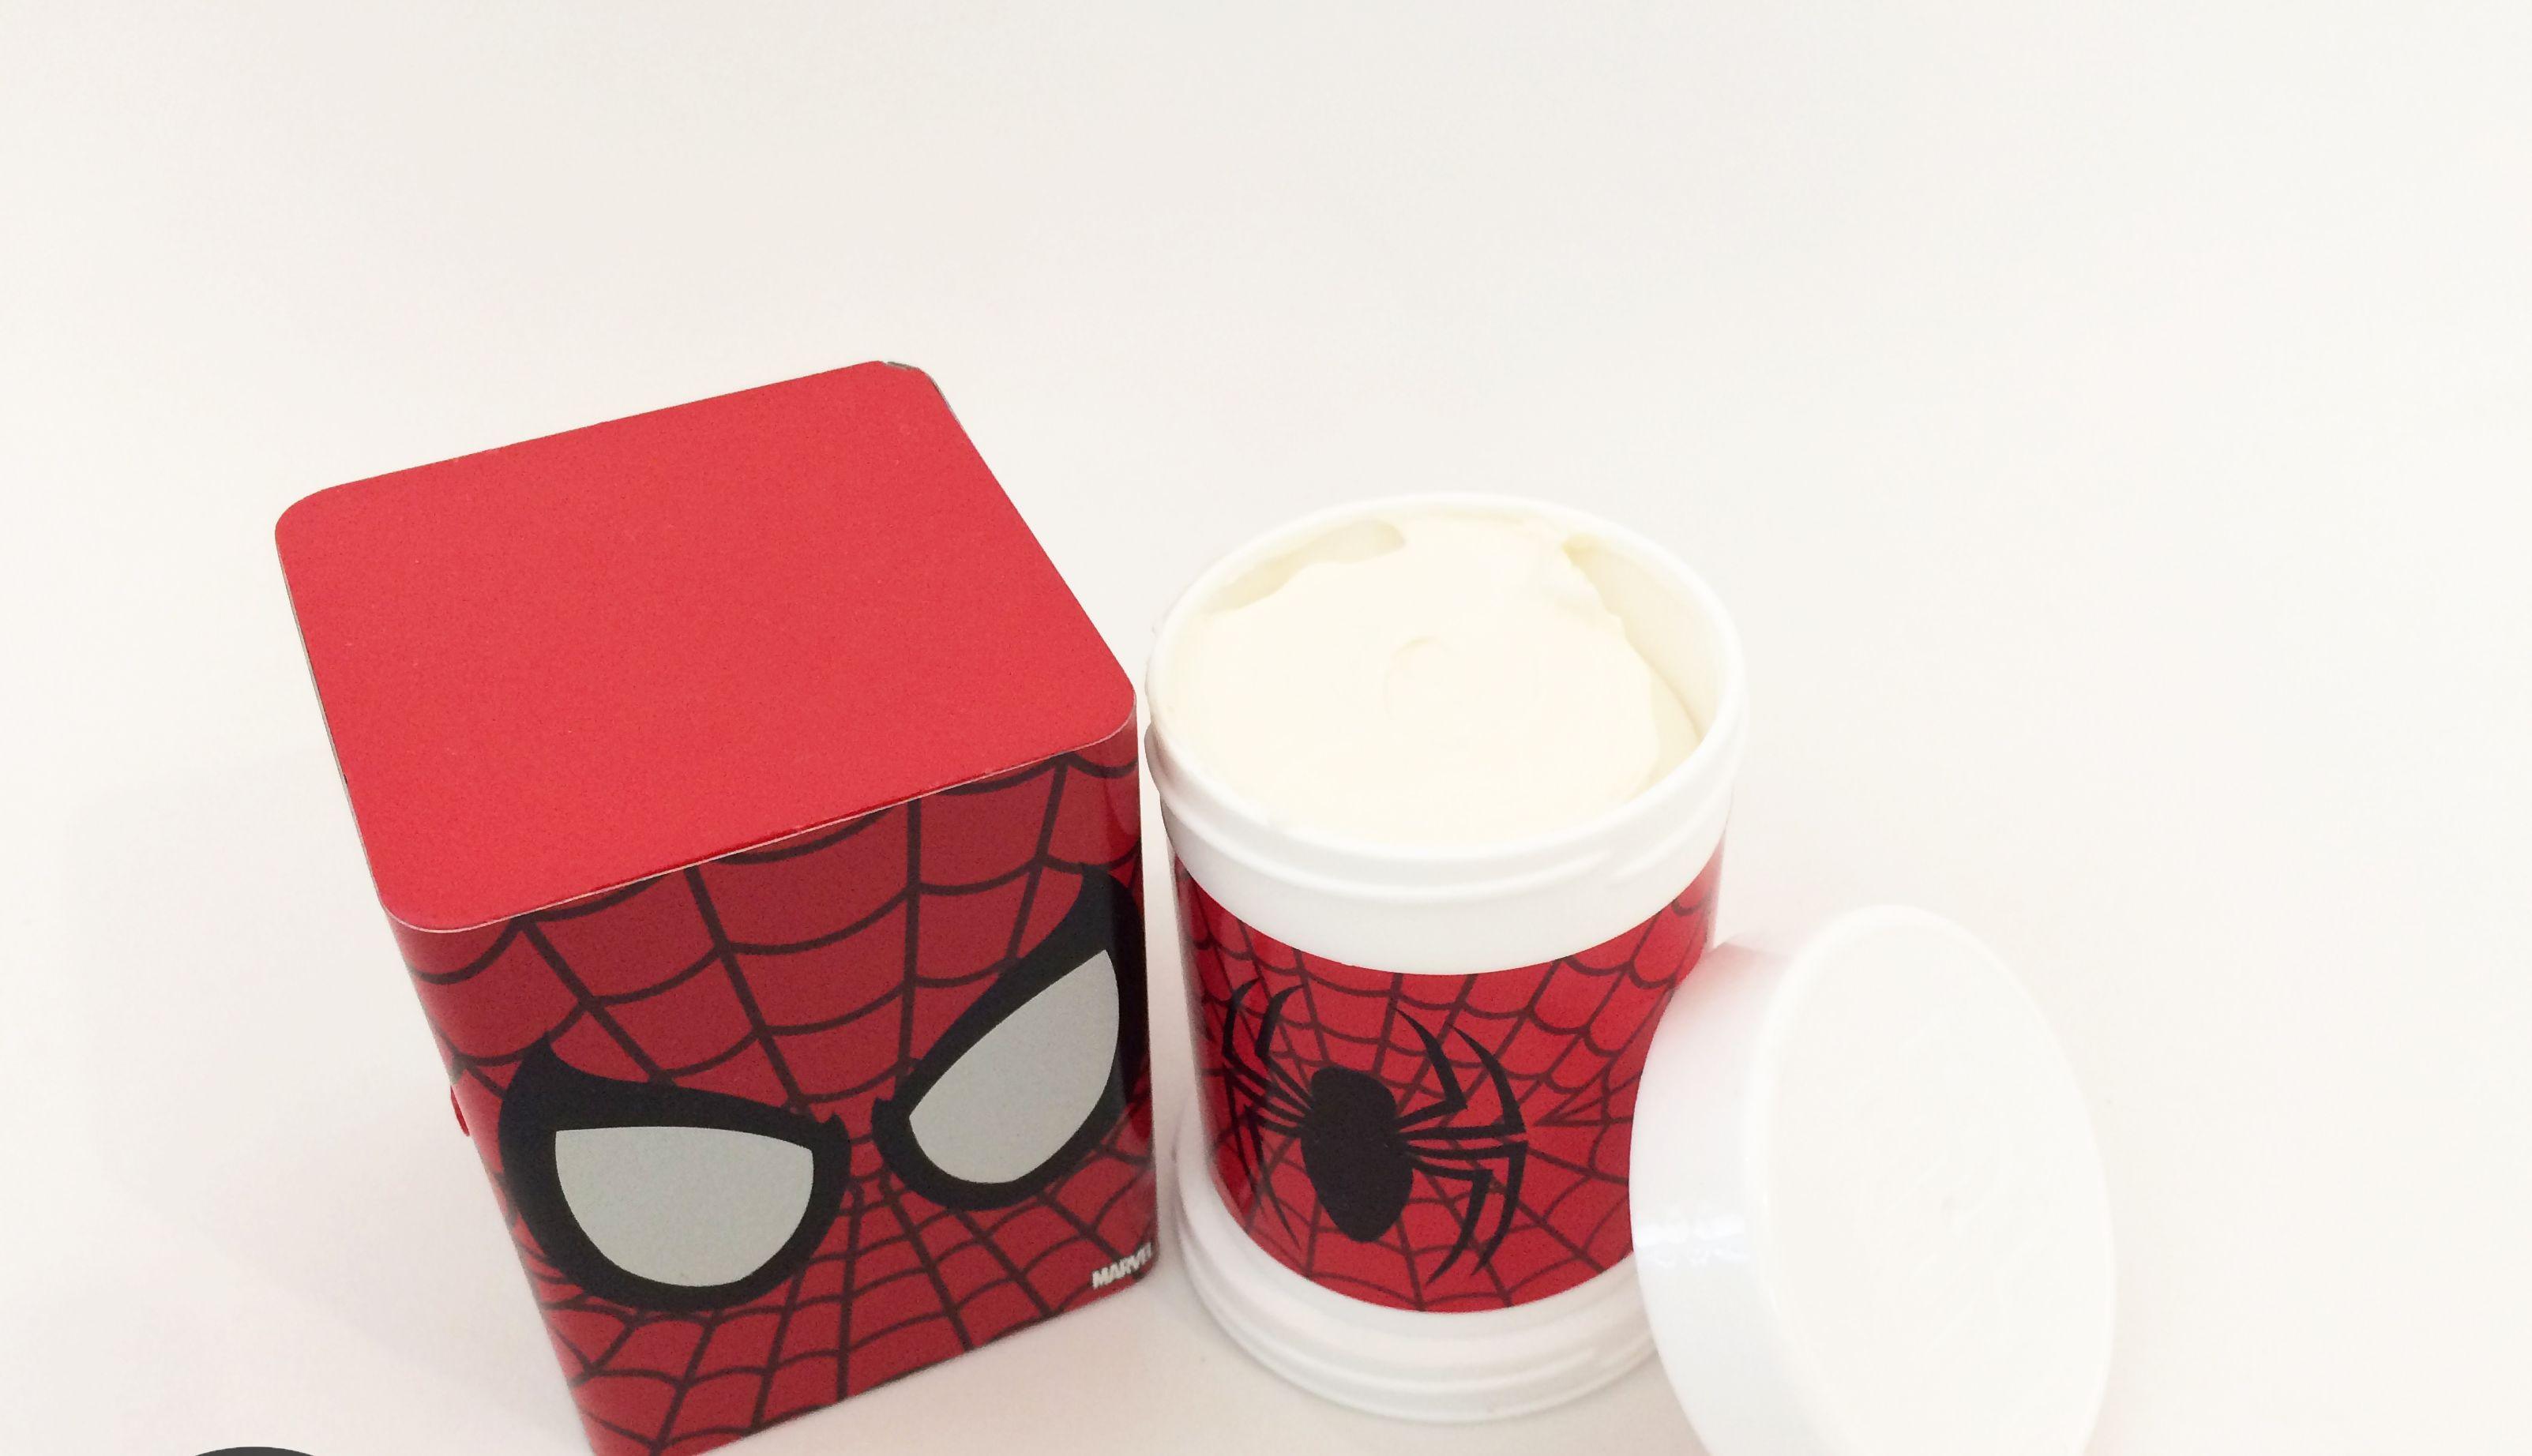 Sáp 2Vee Hard Wax Spider Man Series 2